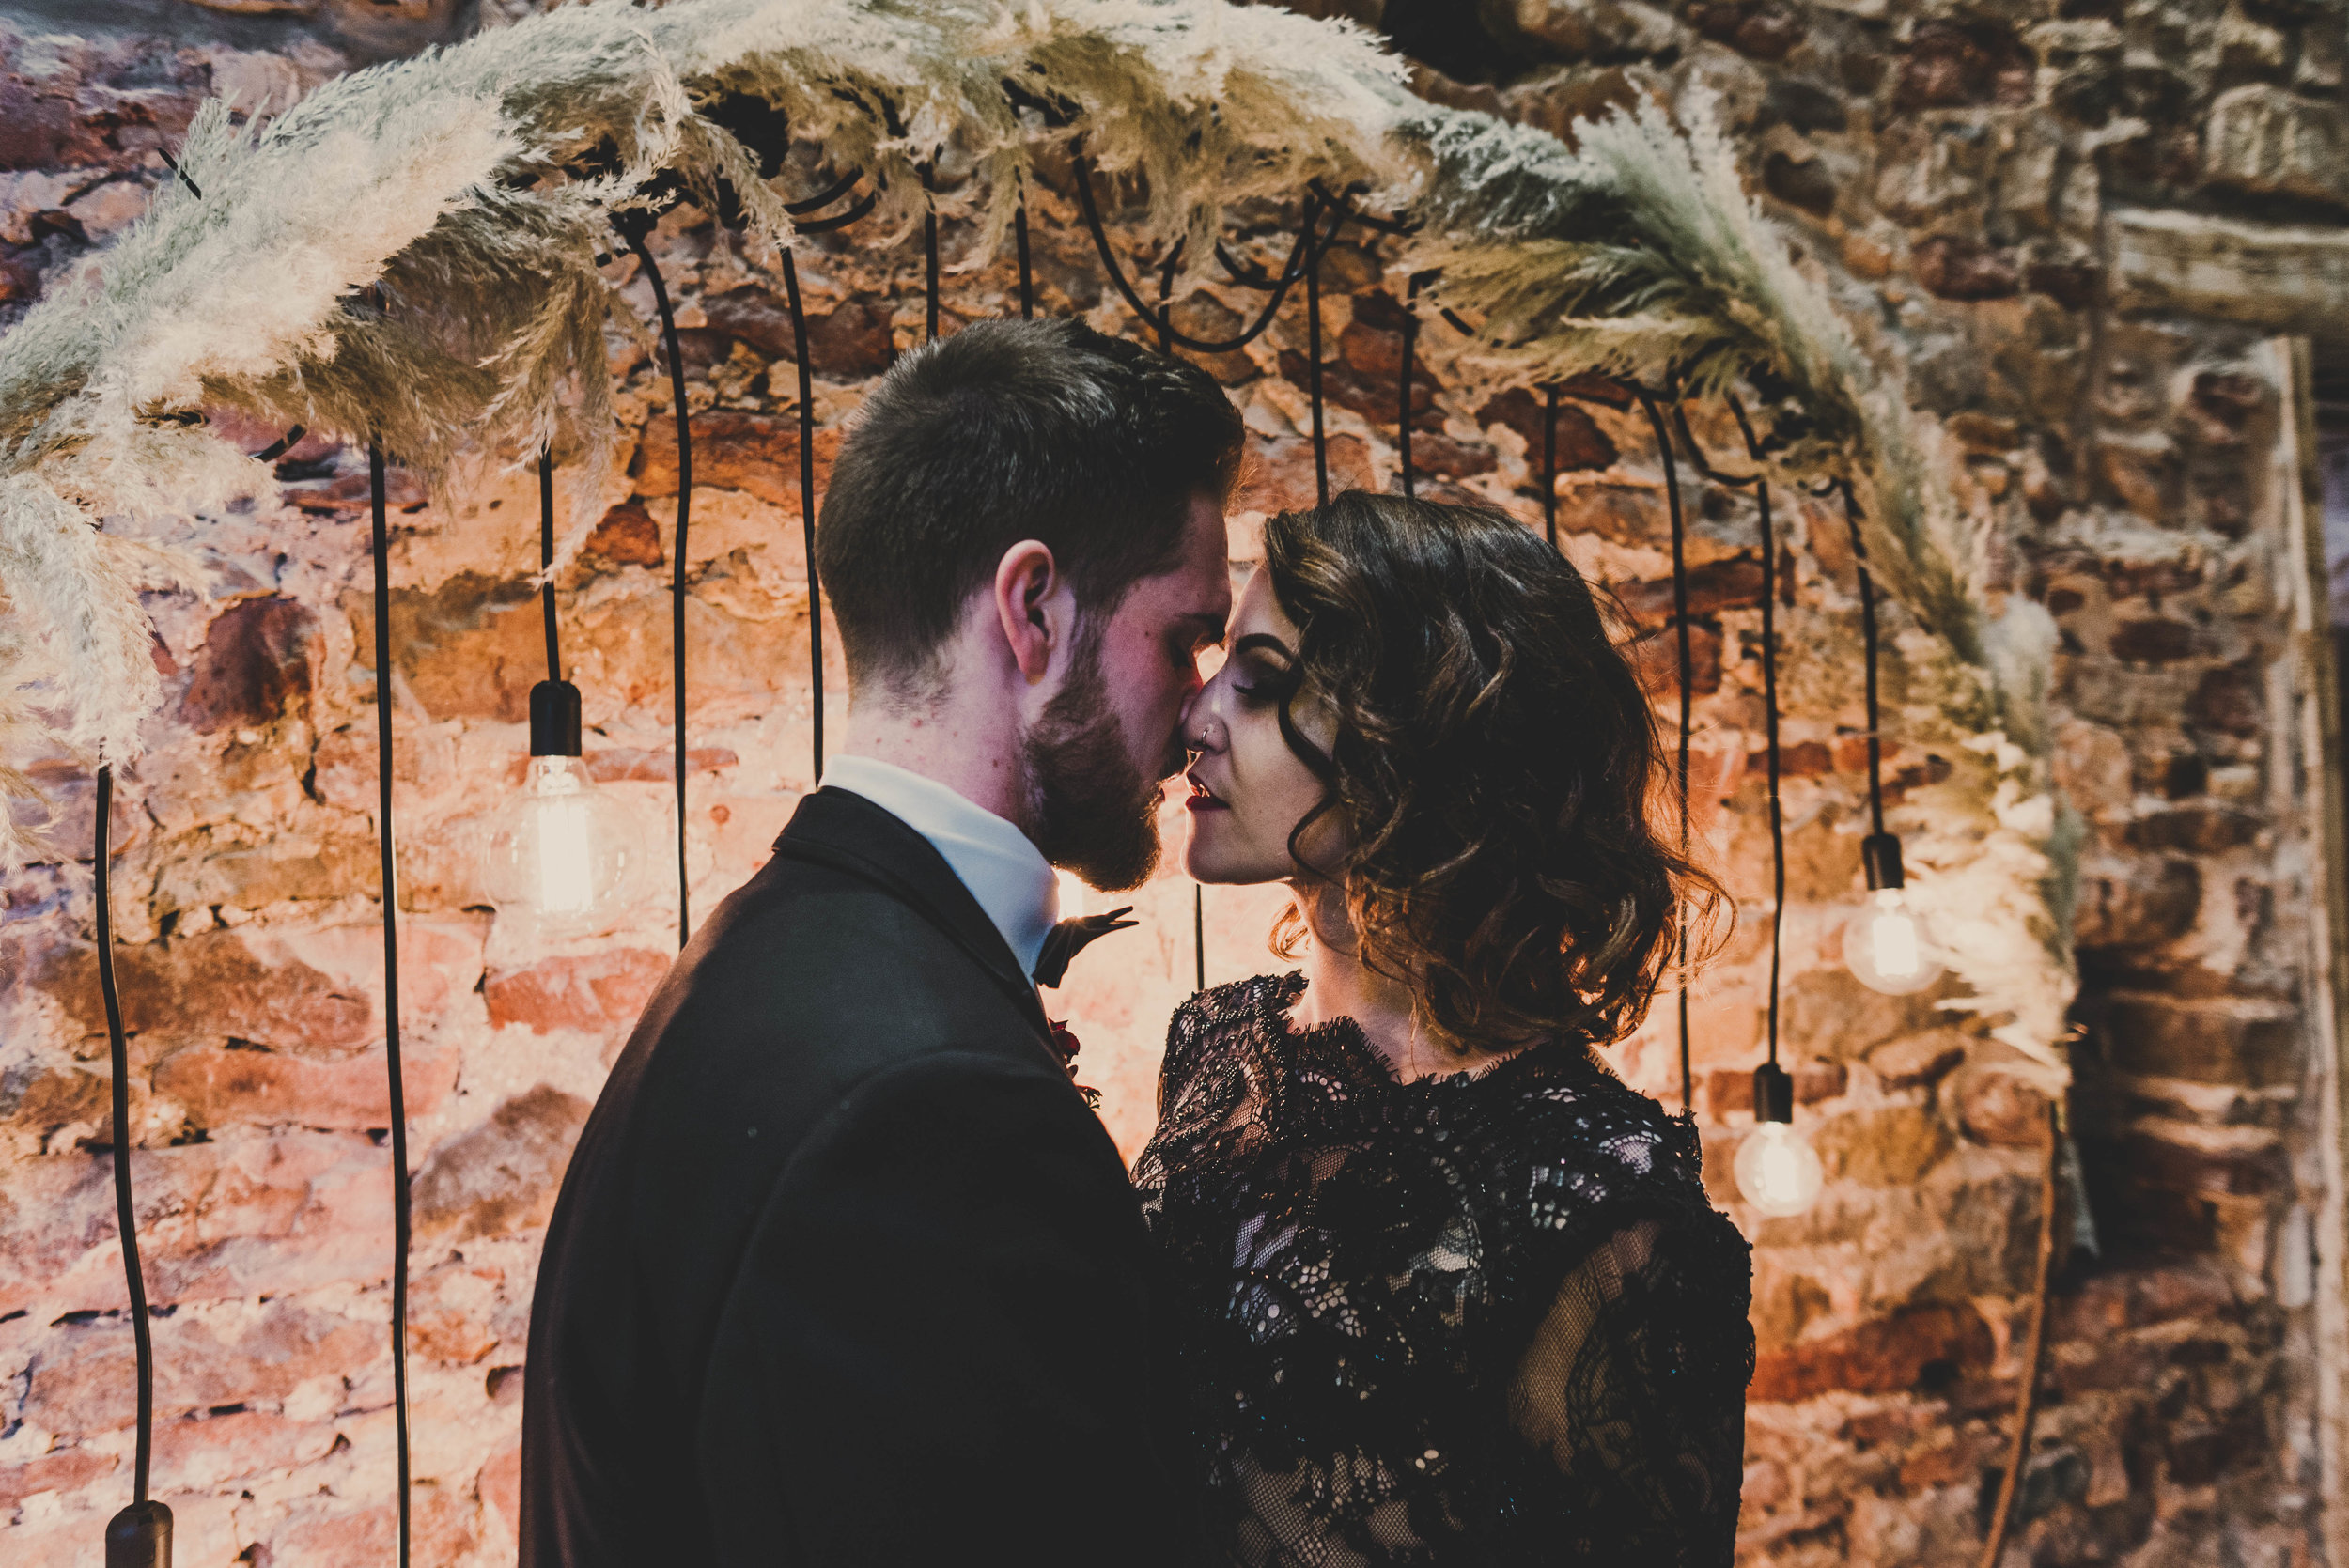 alternative-wedding-phootography-cumbria (9).jpg